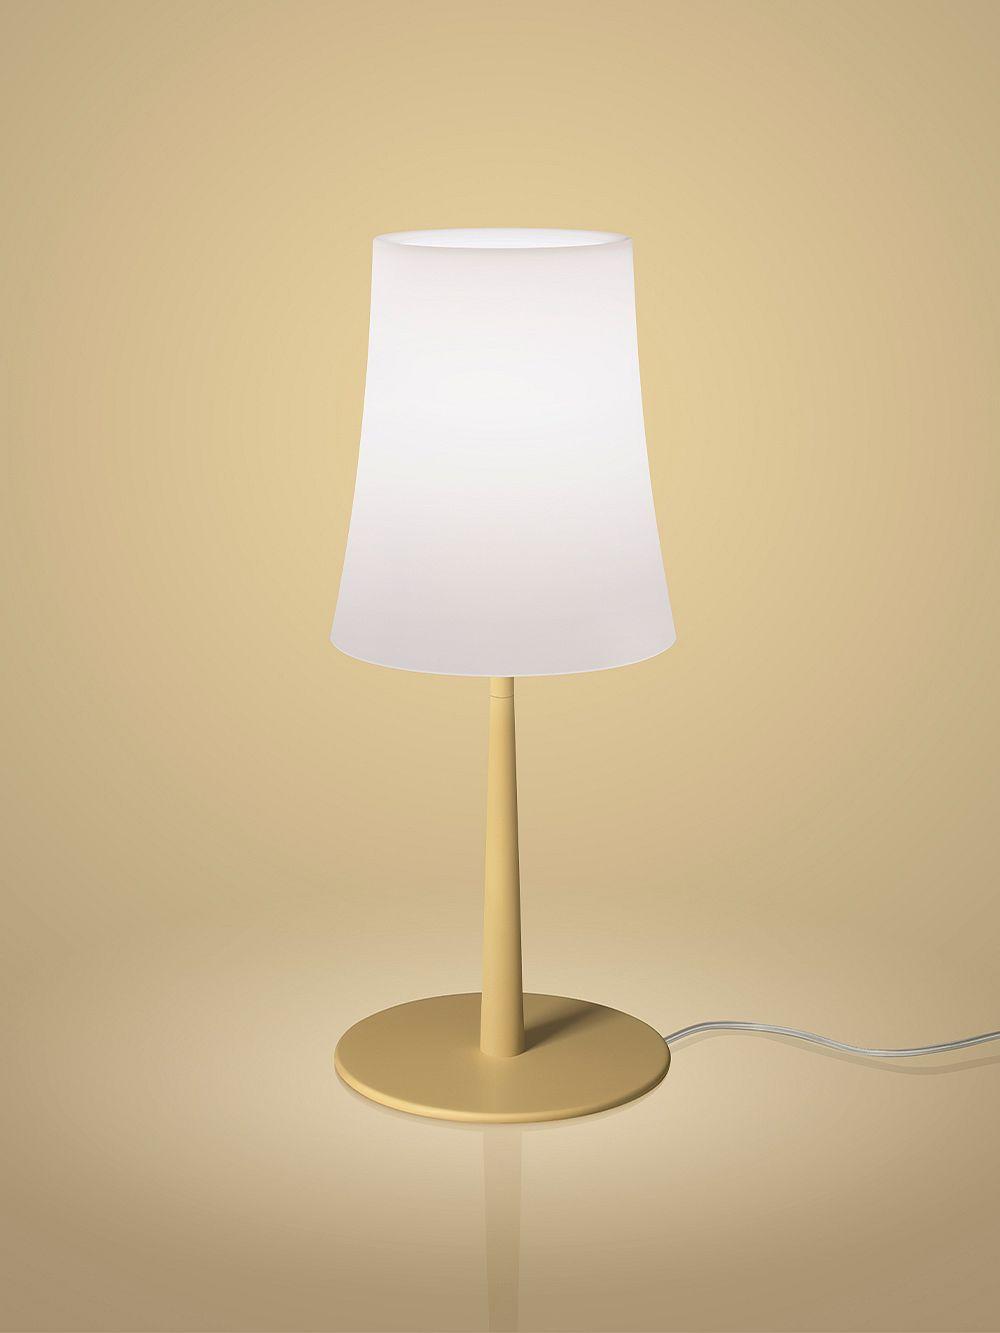 Foscarini Birdie Easy table lamp, sand yellow